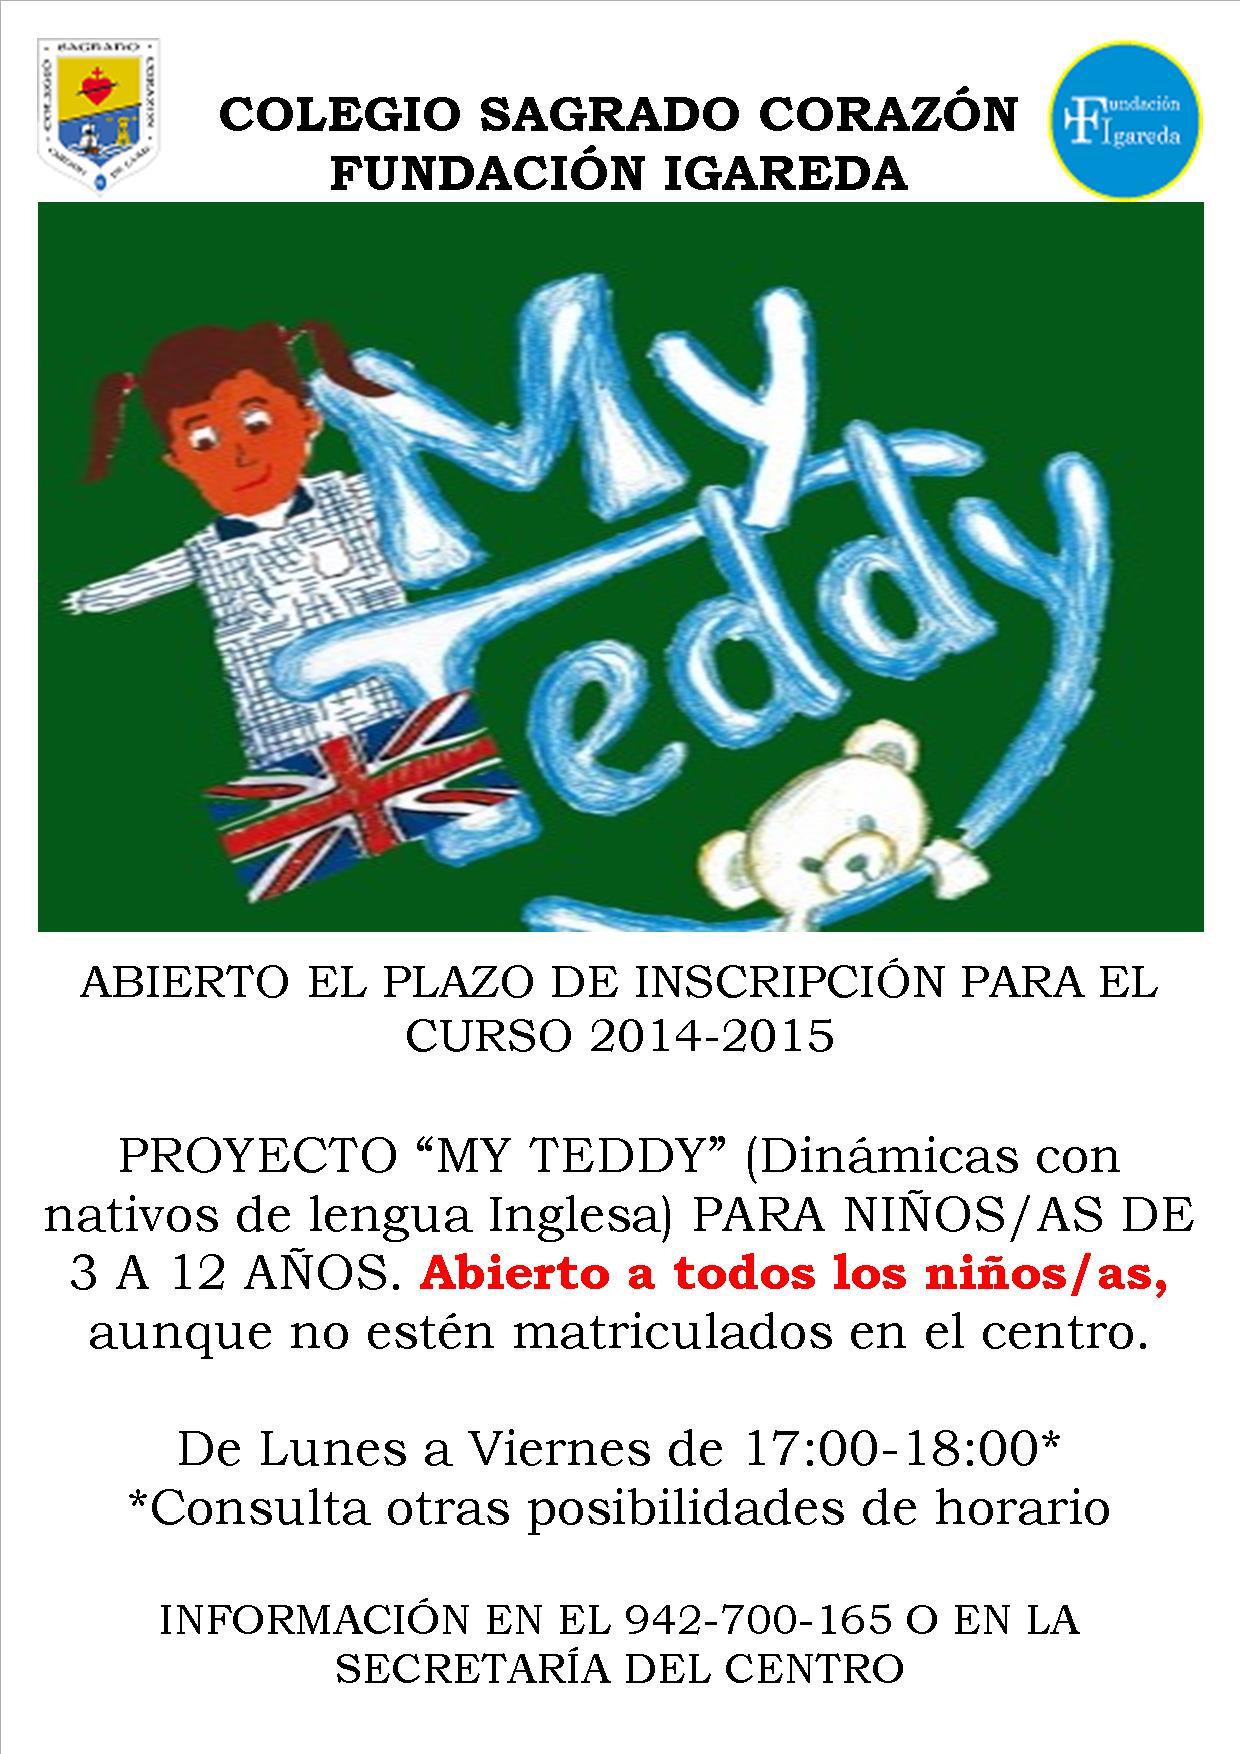 http://www.cabezondelasal.net/wp-content/uploads/2014/09/Cartel-My-Teddy-2014.2015-A4.jpg